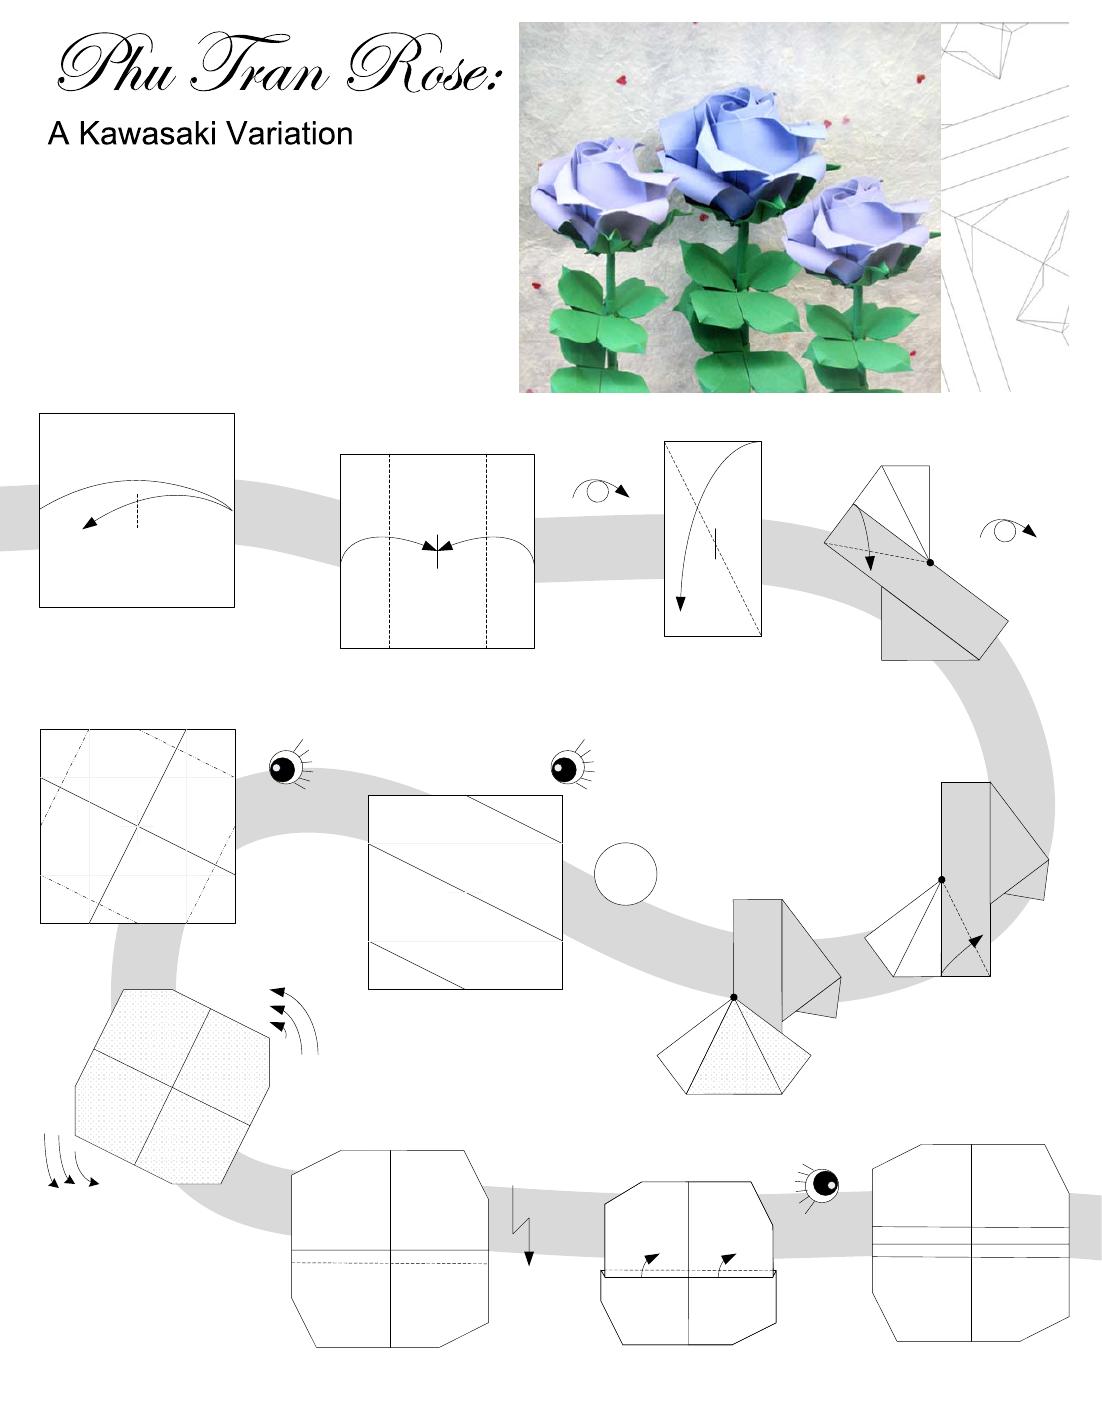 medium resolution of origami rose diagram phu tran rose origami roses origami origami kawasaki rose diagrams origami pinterest